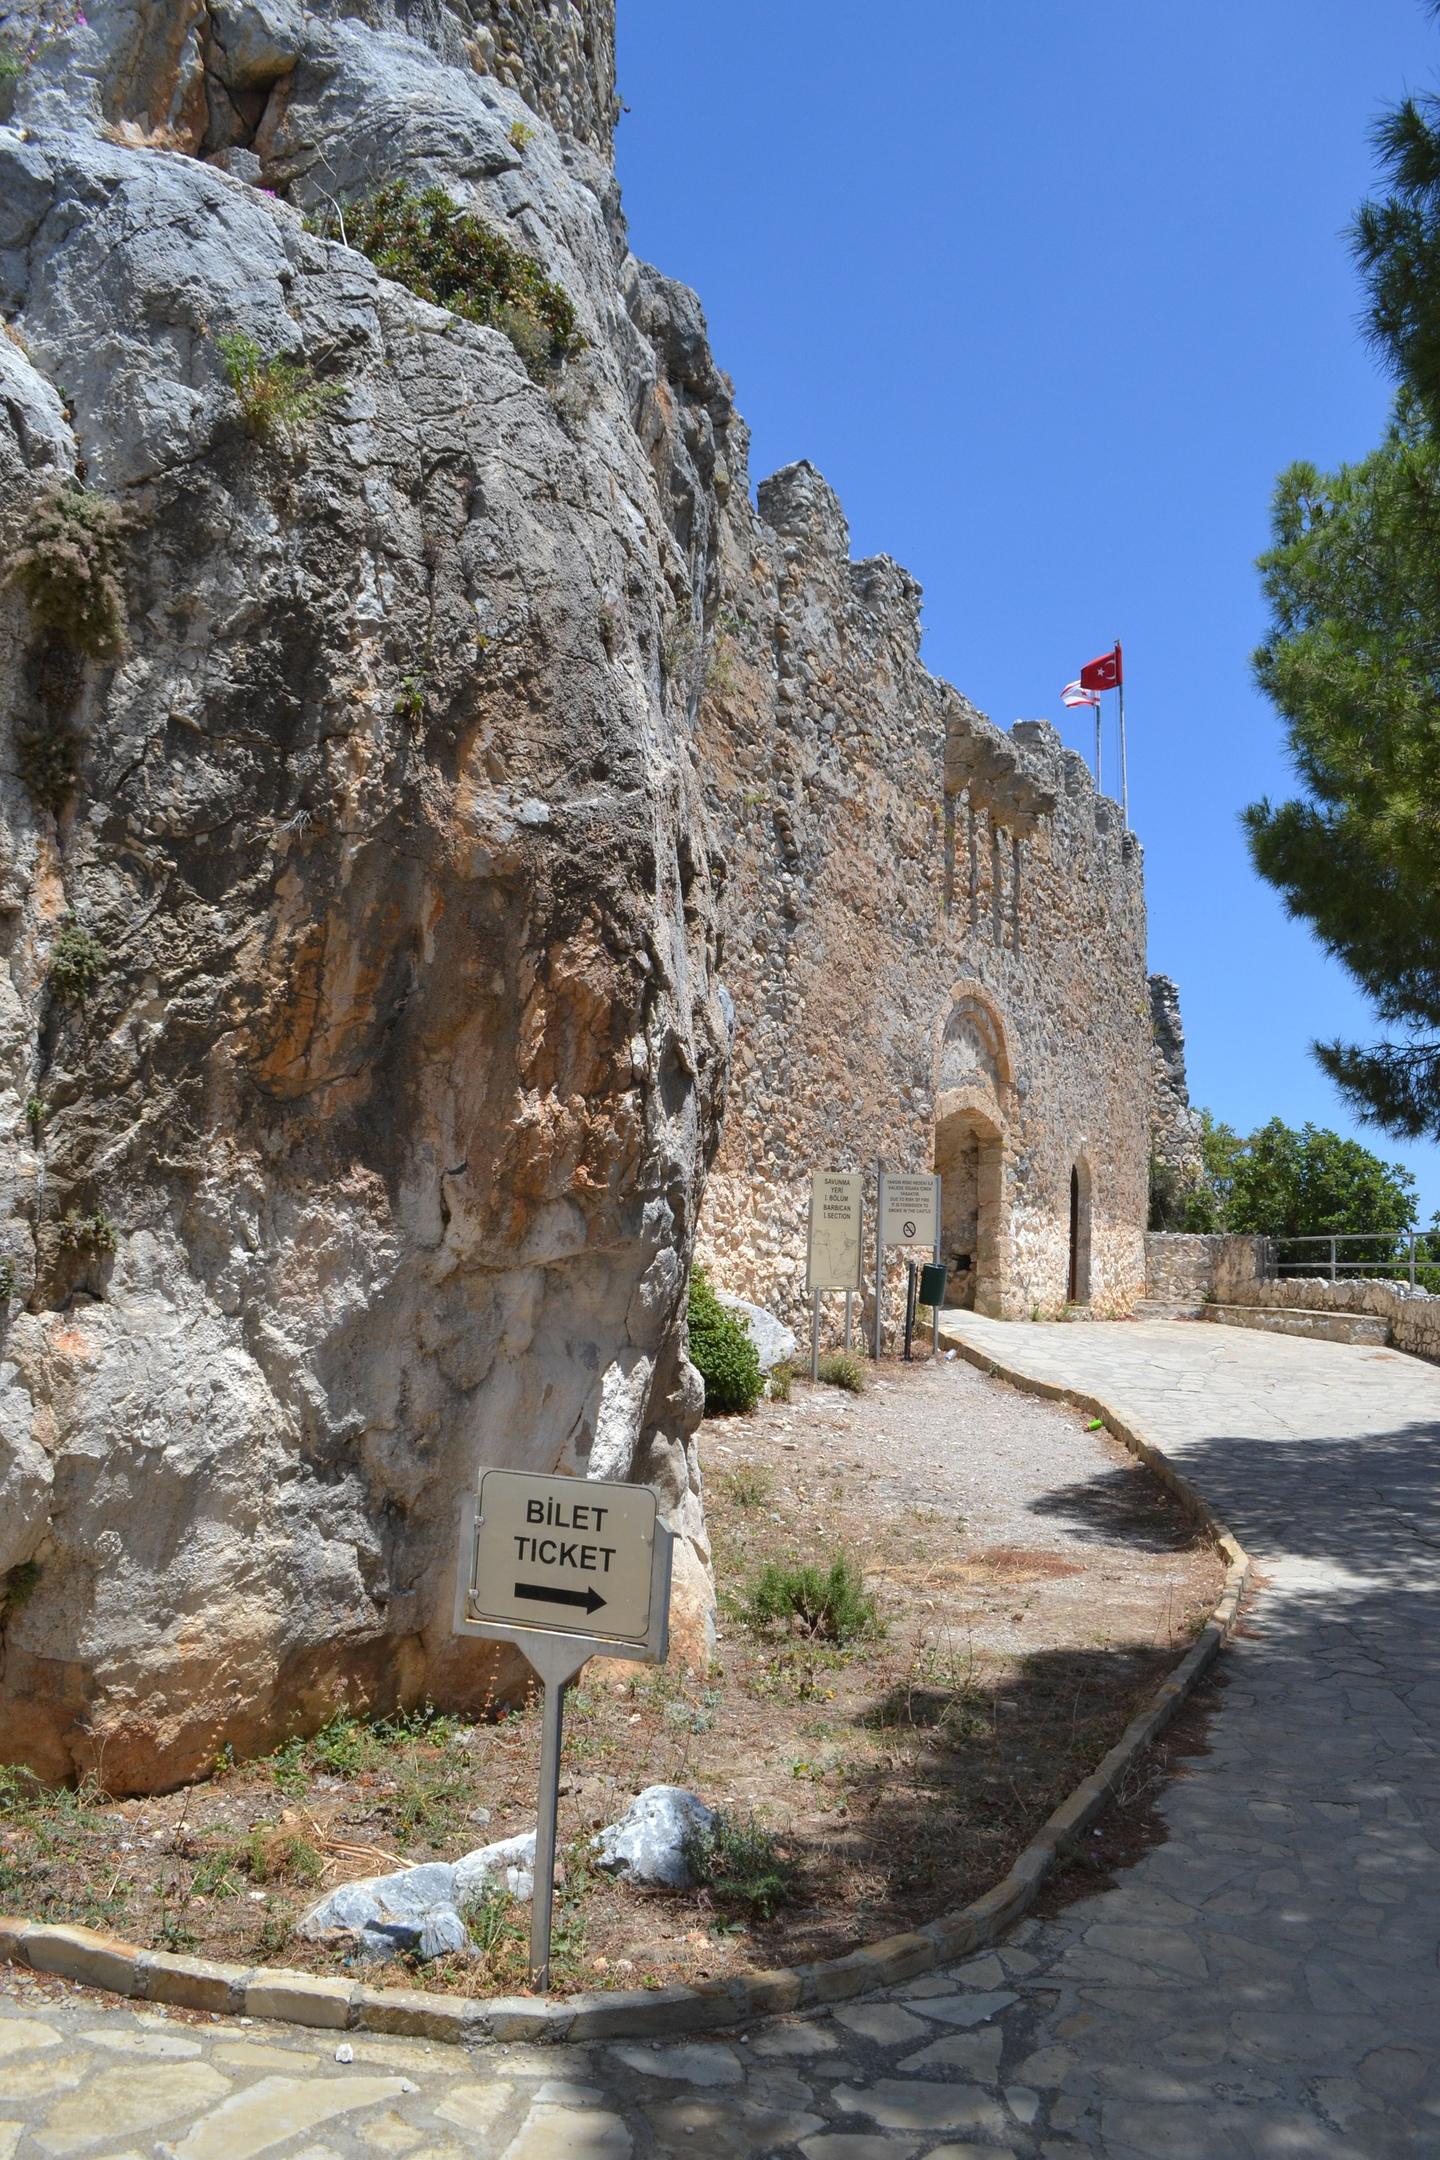 Северный Кипр. Замок Святого Иллариона. (фото). X2rTwIgZ9Ns